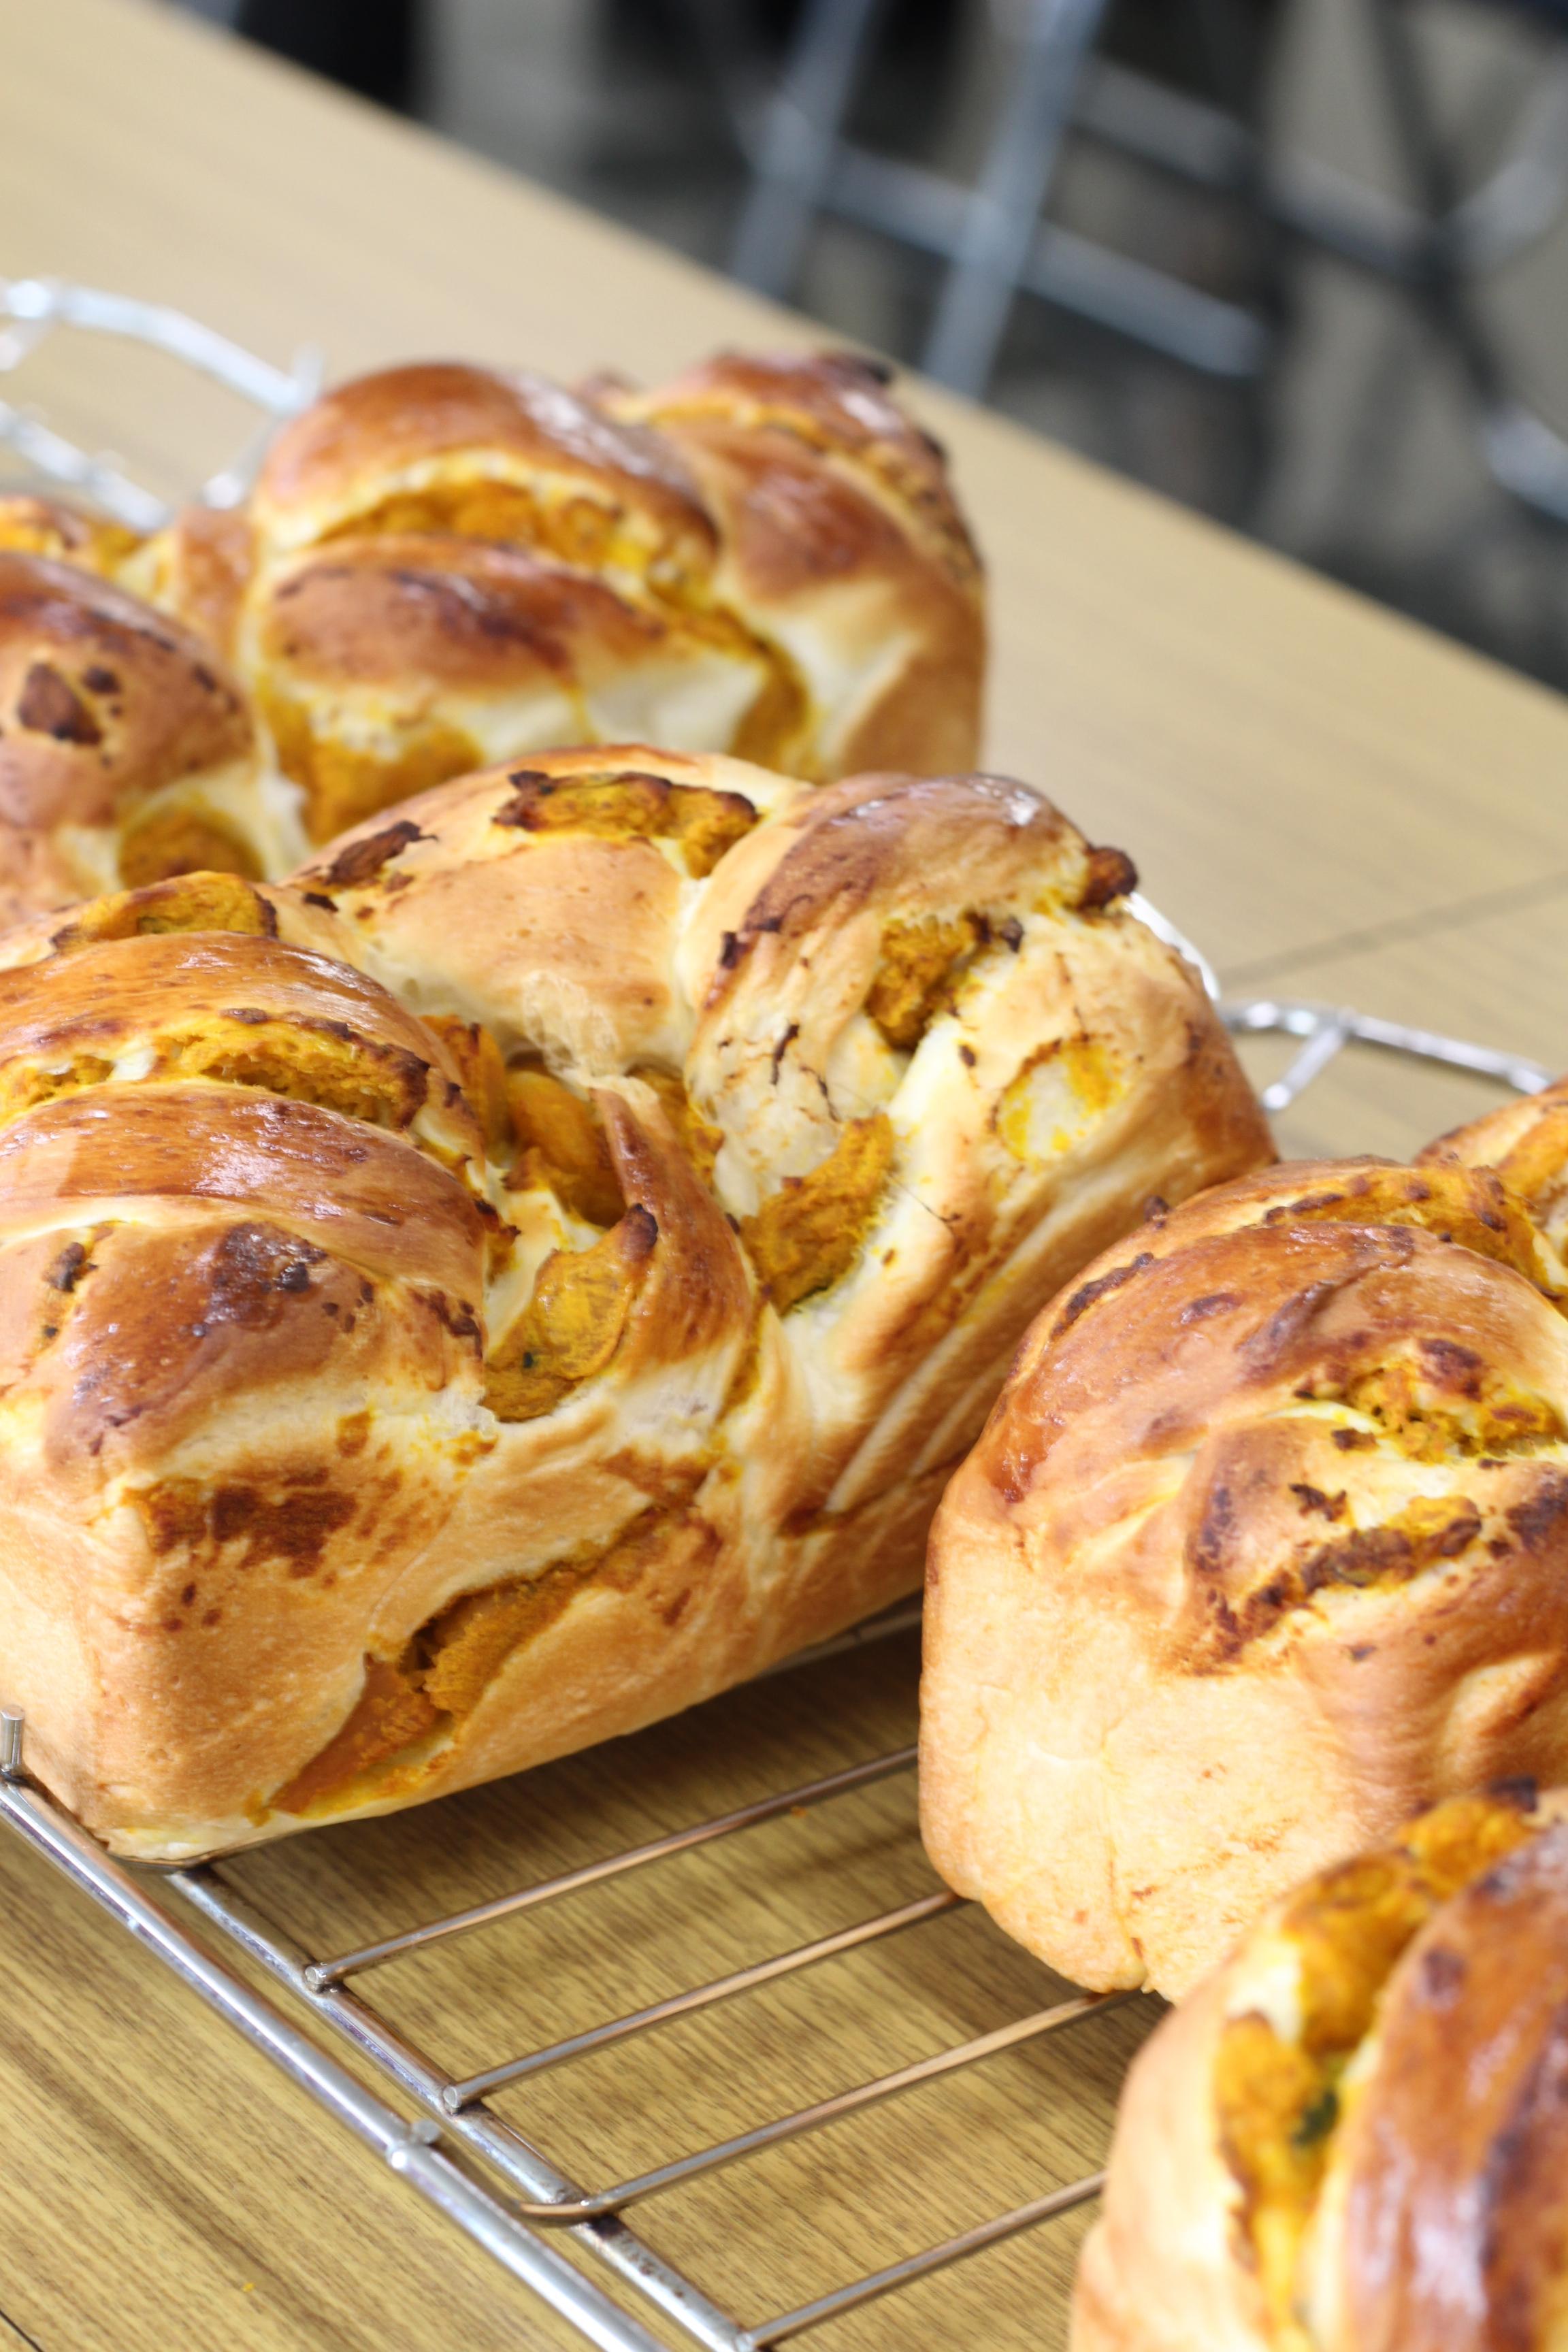 a-ta-sante糖質制限パン料理教室、阿倍野区西田辺。会館でのレッスン『パプキン餡食パン』最終回。